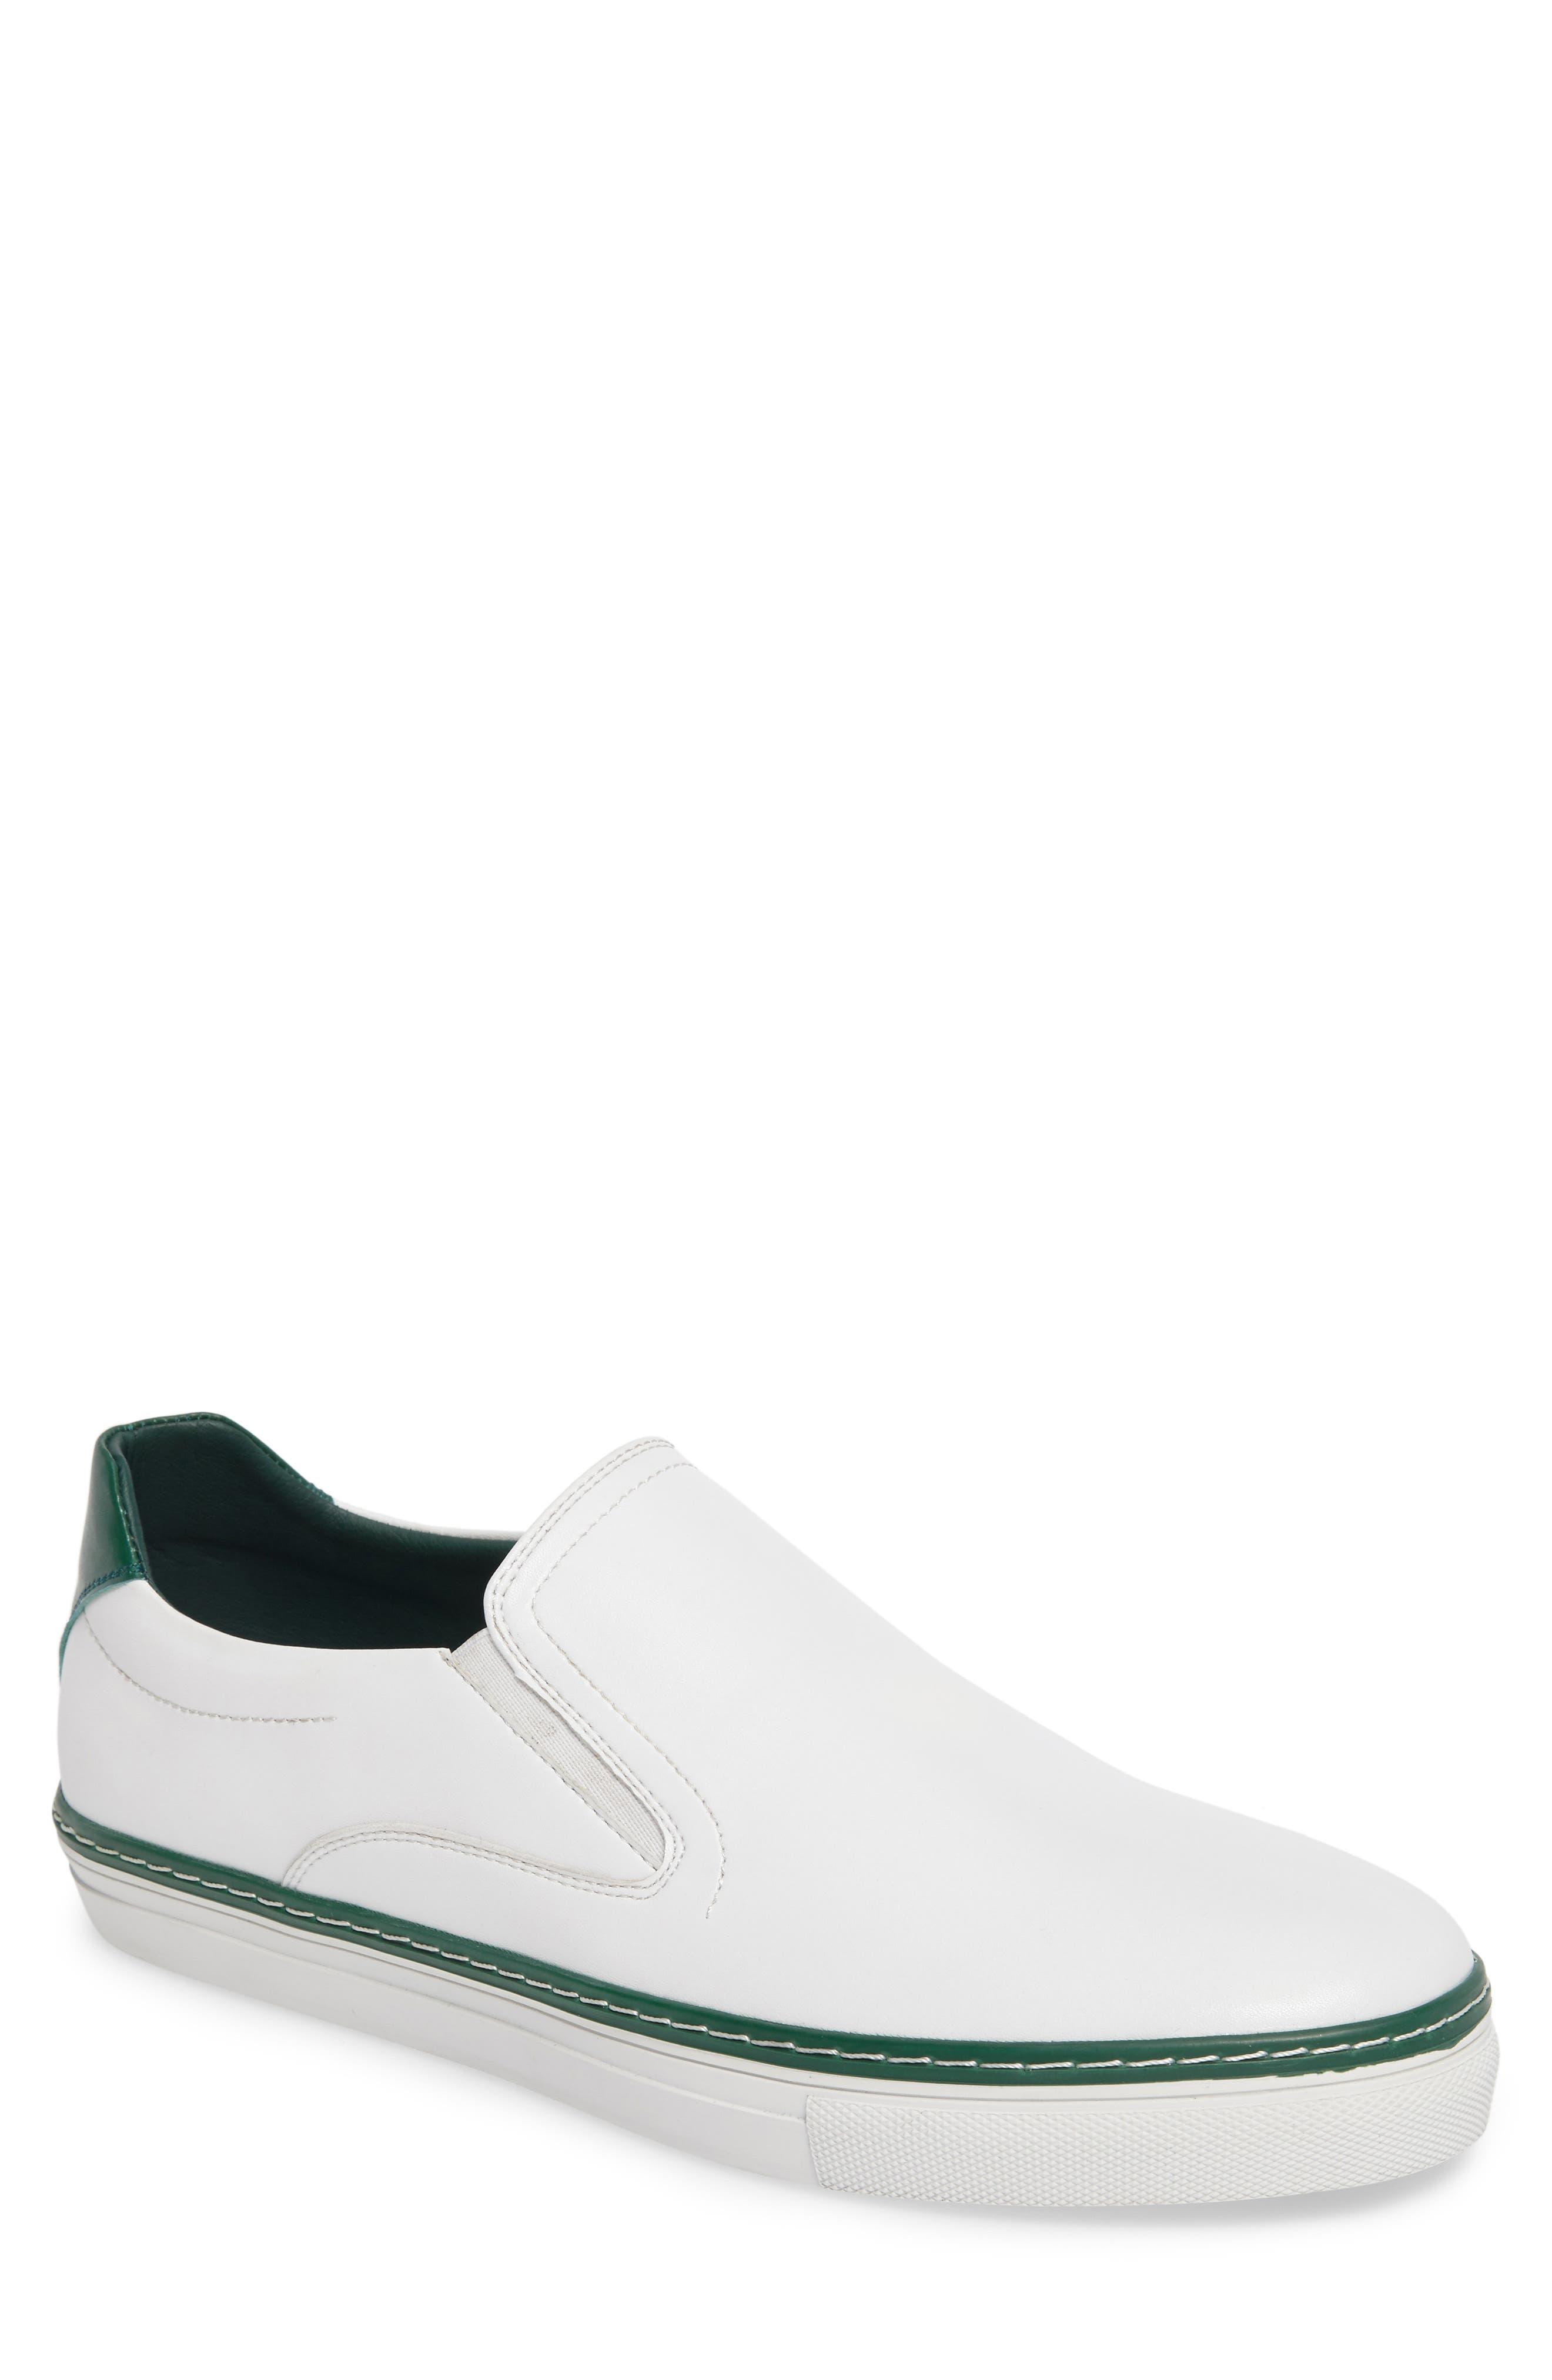 Dollis Slip-On,                             Main thumbnail 1, color,                             White Leather